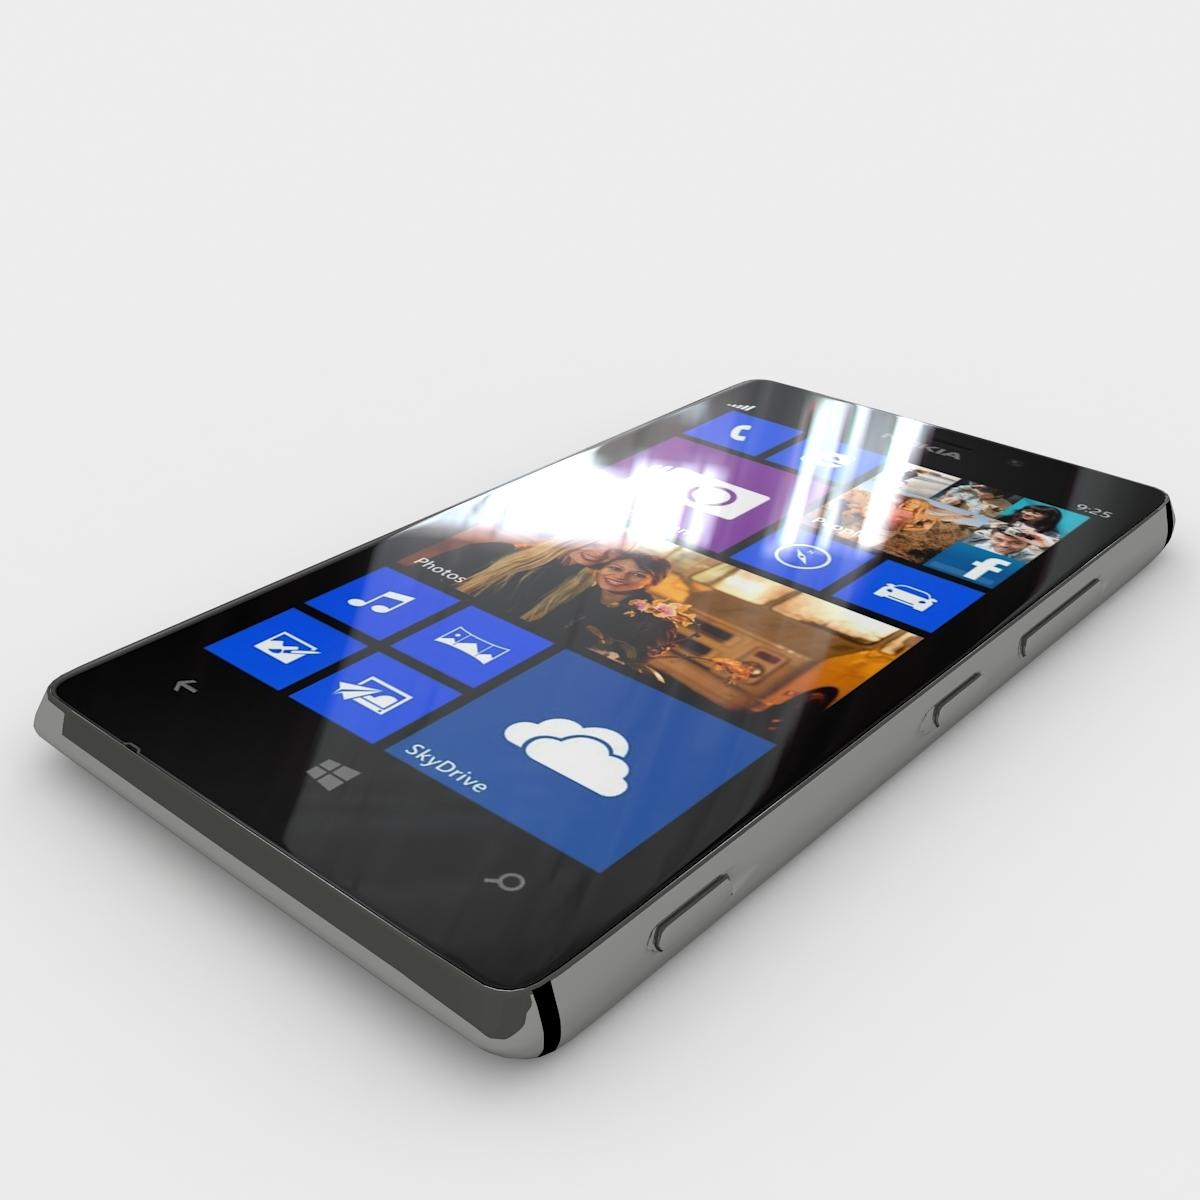 Nokia lumia 925 jpg - Nokia Lumia 925 Black 3docean Item For Sale 01 Jpg